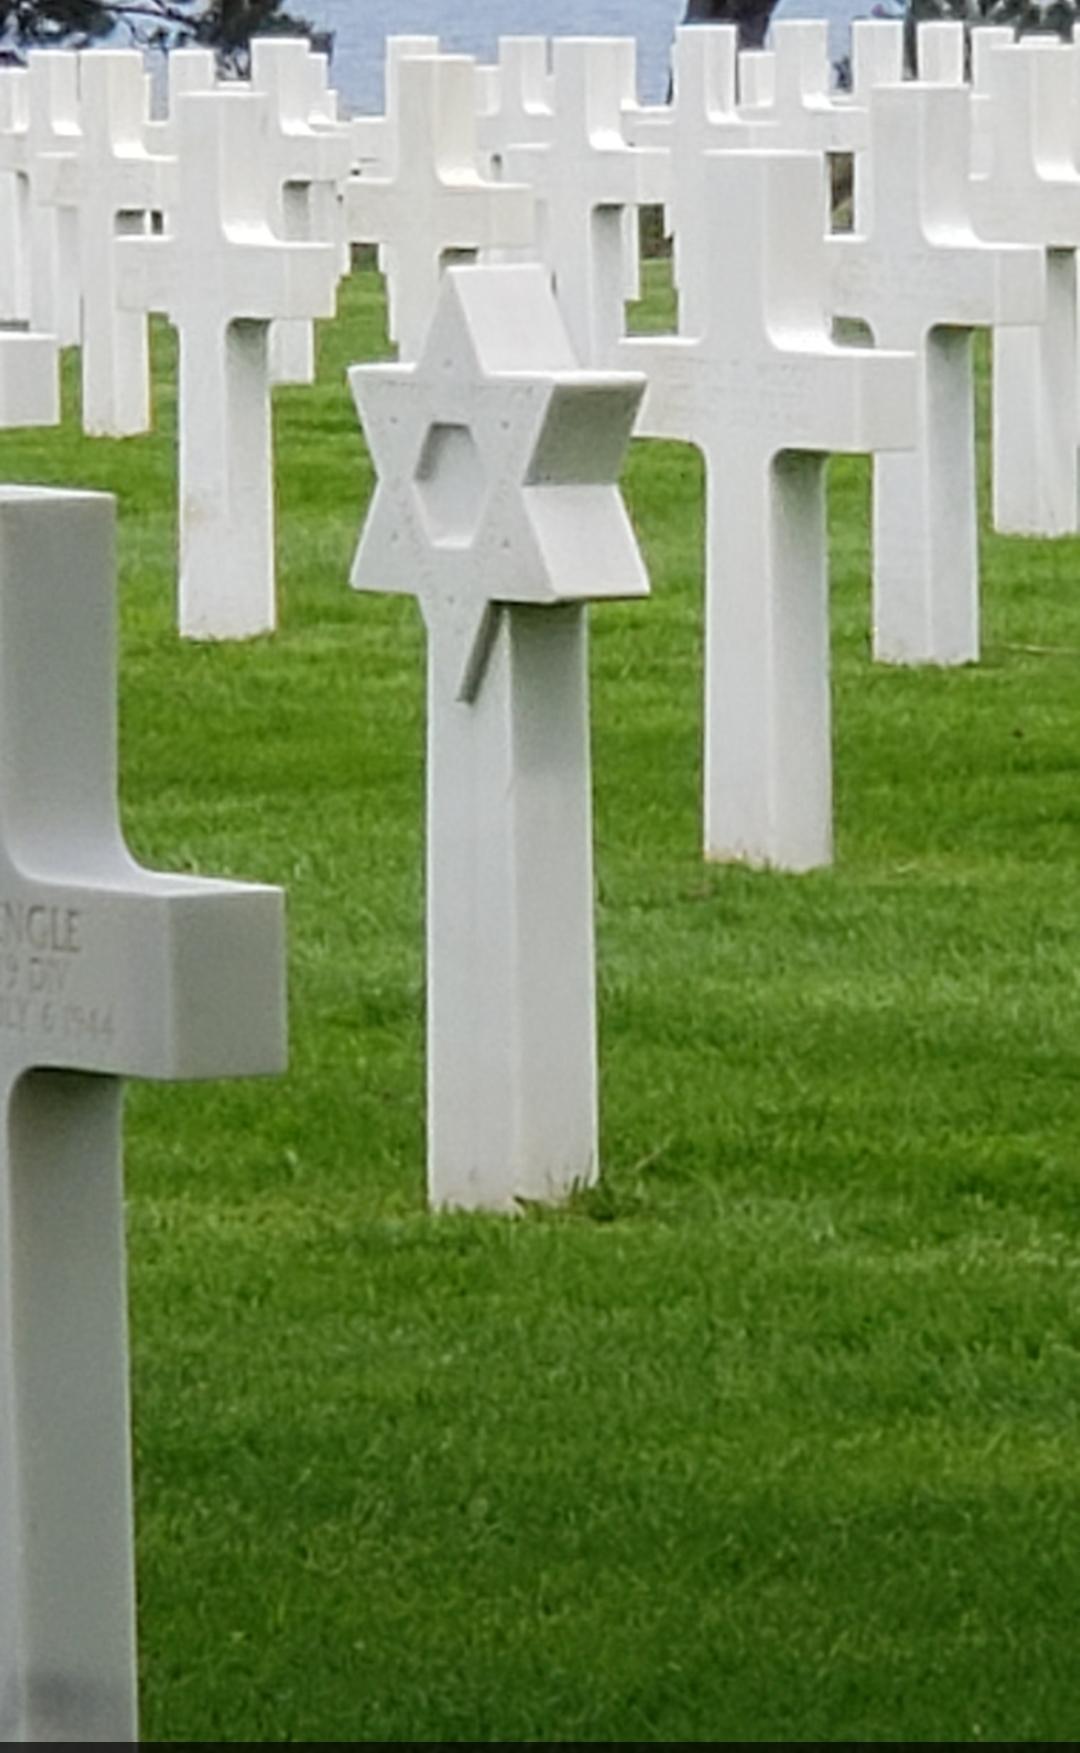 Jewish gravestones at the American cemetery in Normandy (Courtesy Susie Davidson)